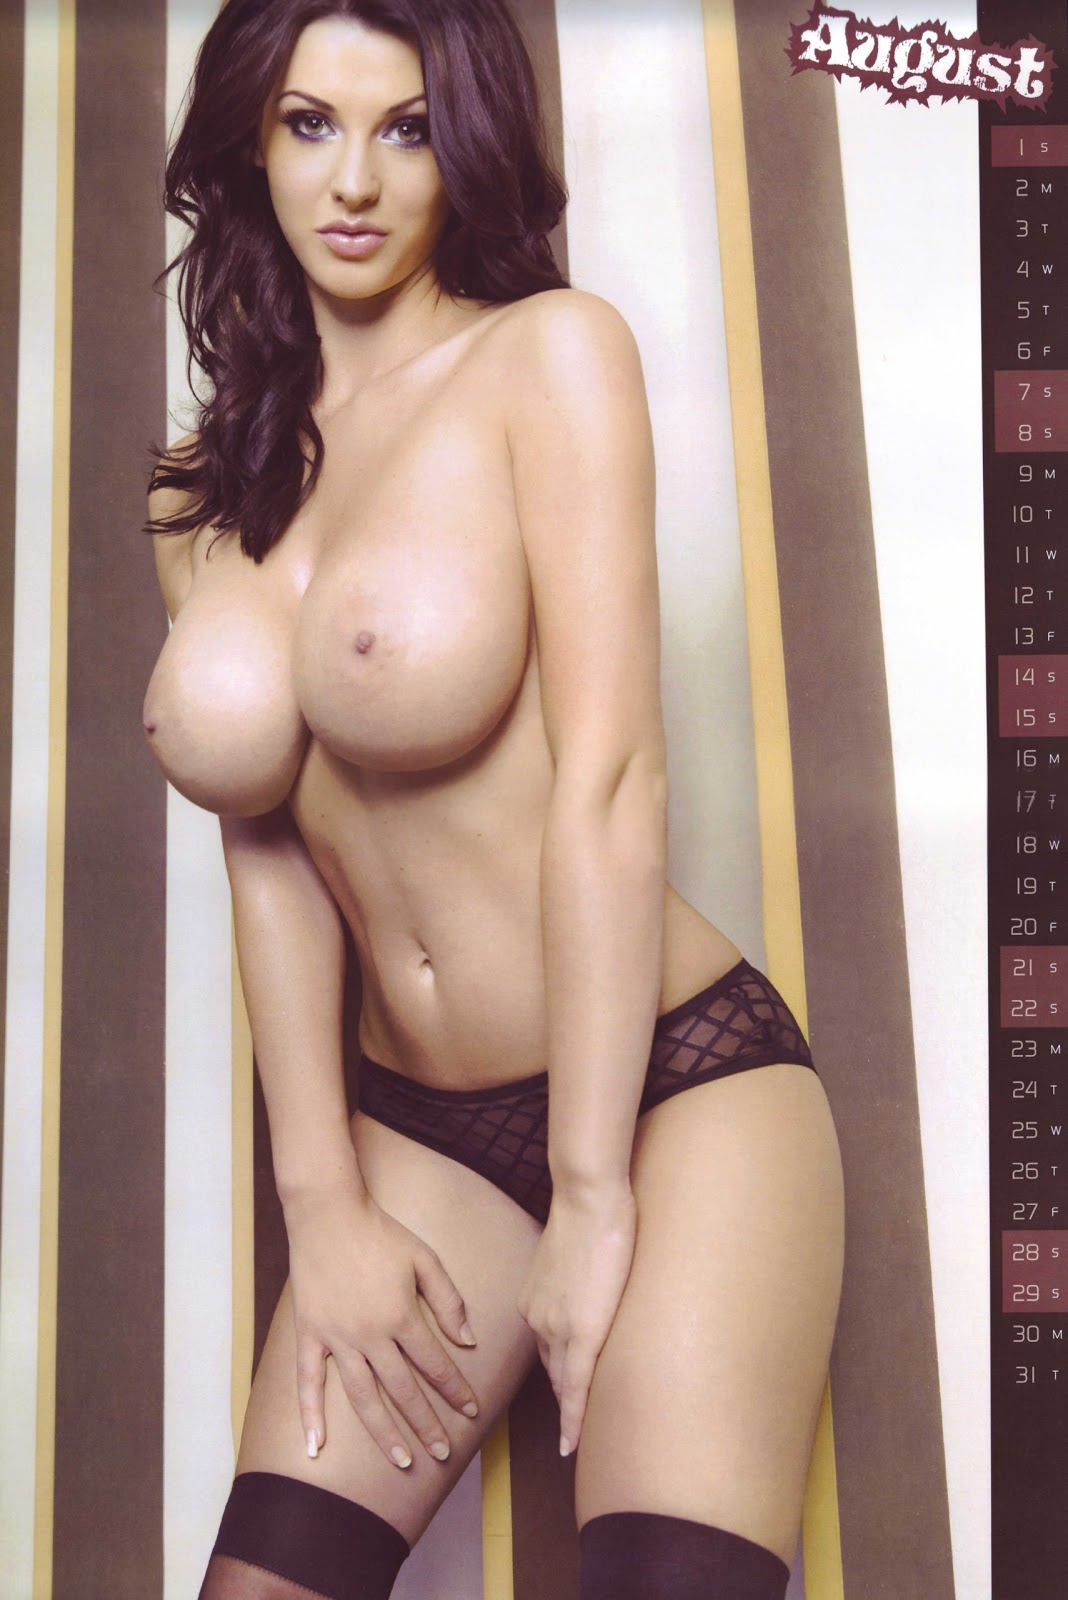 http://3.bp.blogspot.com/-gPbtrcMwnDM/T7hFjeJIqnI/AAAAAAAABuw/sCZYD2JgVwU/s1600/alice-goodwin-2010-calendar-nude-boobs-sexy+(10).jpg